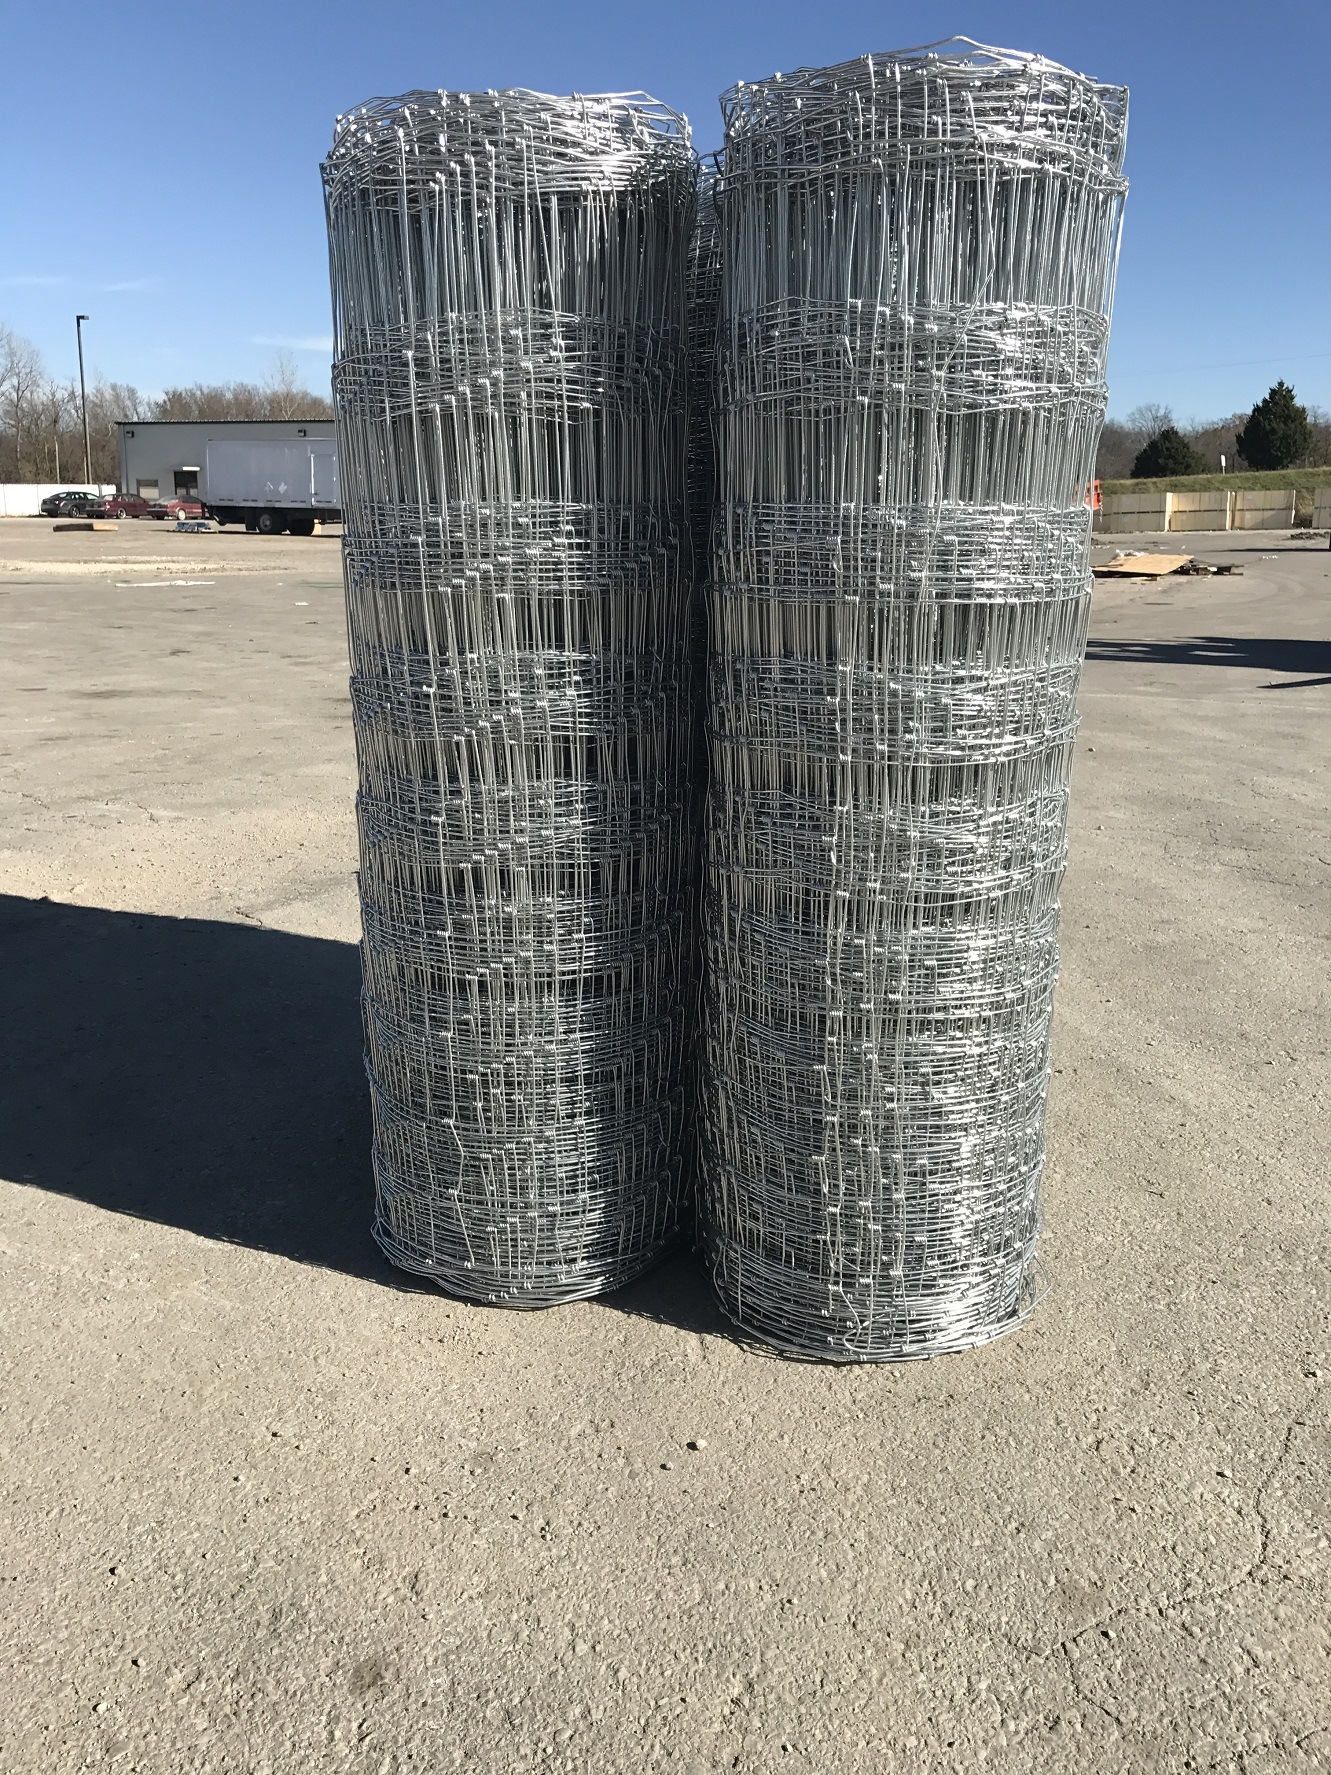 Field Fencing Amp Fencing Supplies Uncle Wiener S Wholesale